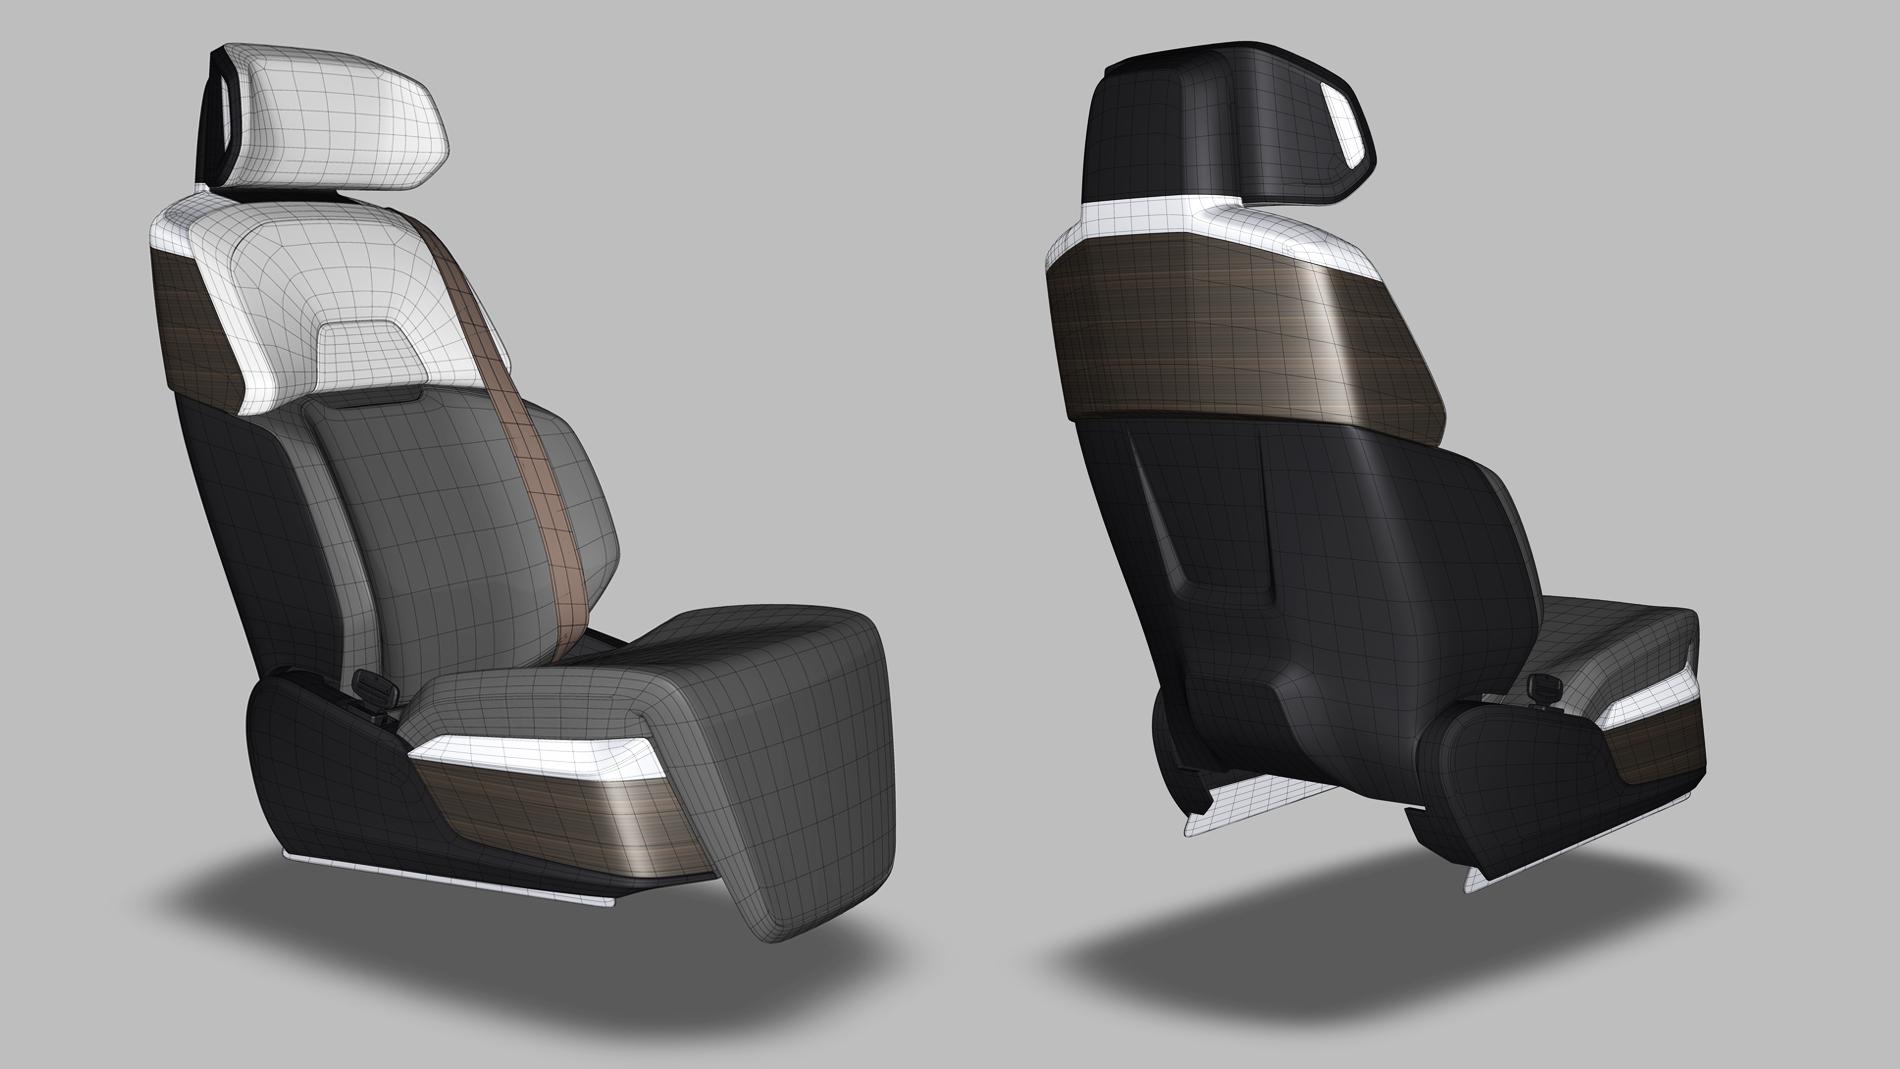 BMW_Zero_G_Concept_Seat_Mesh